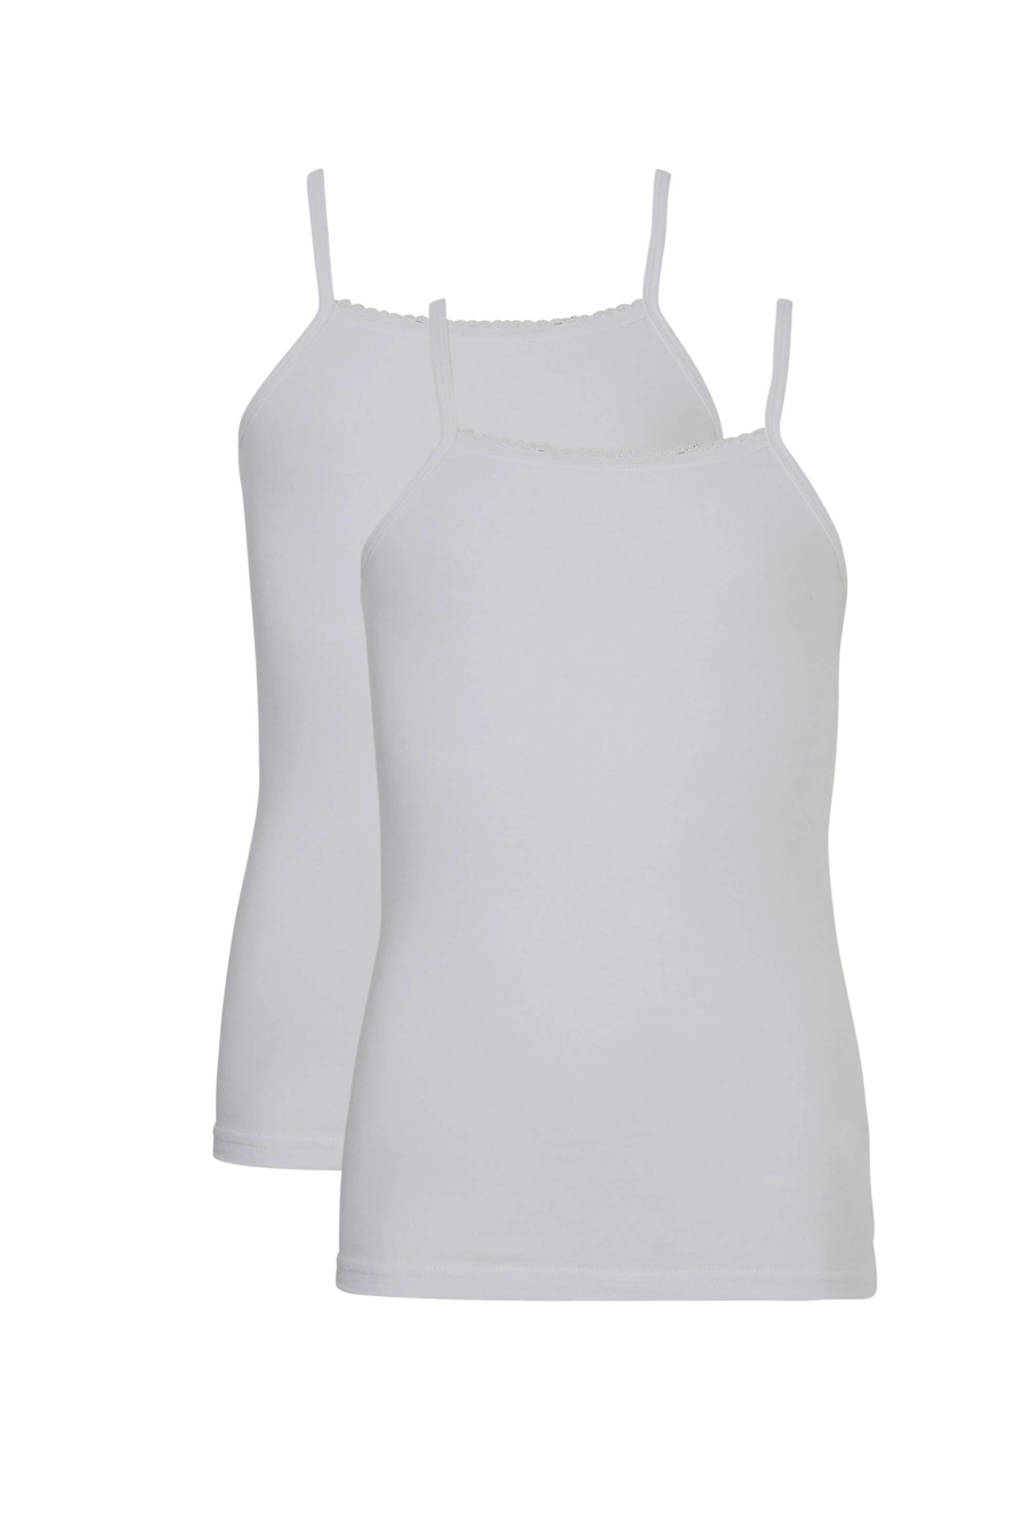 NAME IT hemd wit - set van 2, Wit